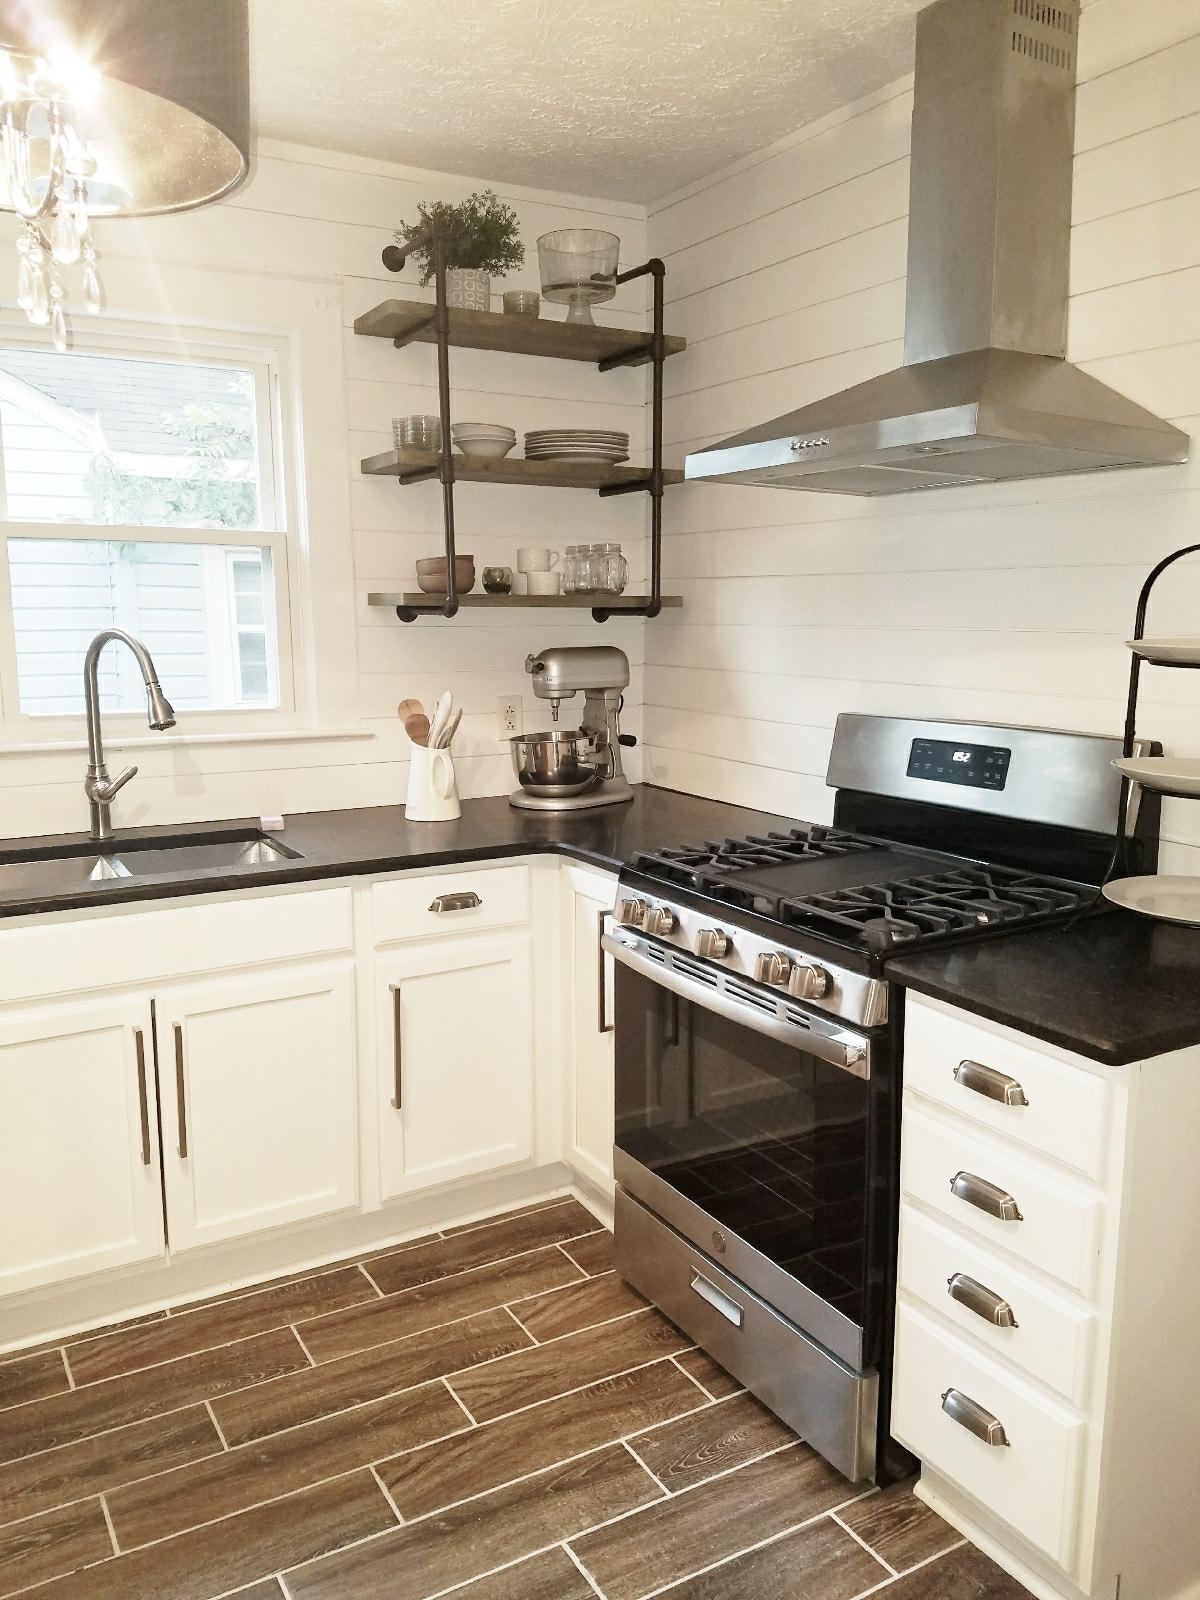 Haymount Homes Greenland Drive Kitchen 18.jpg